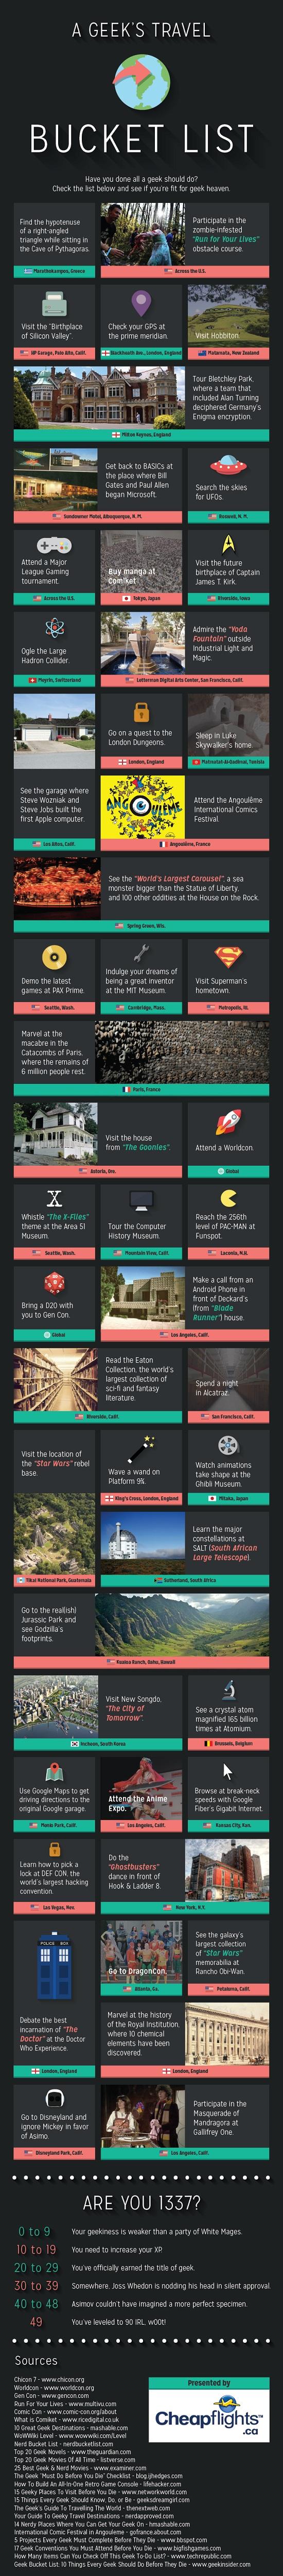 geek travel list